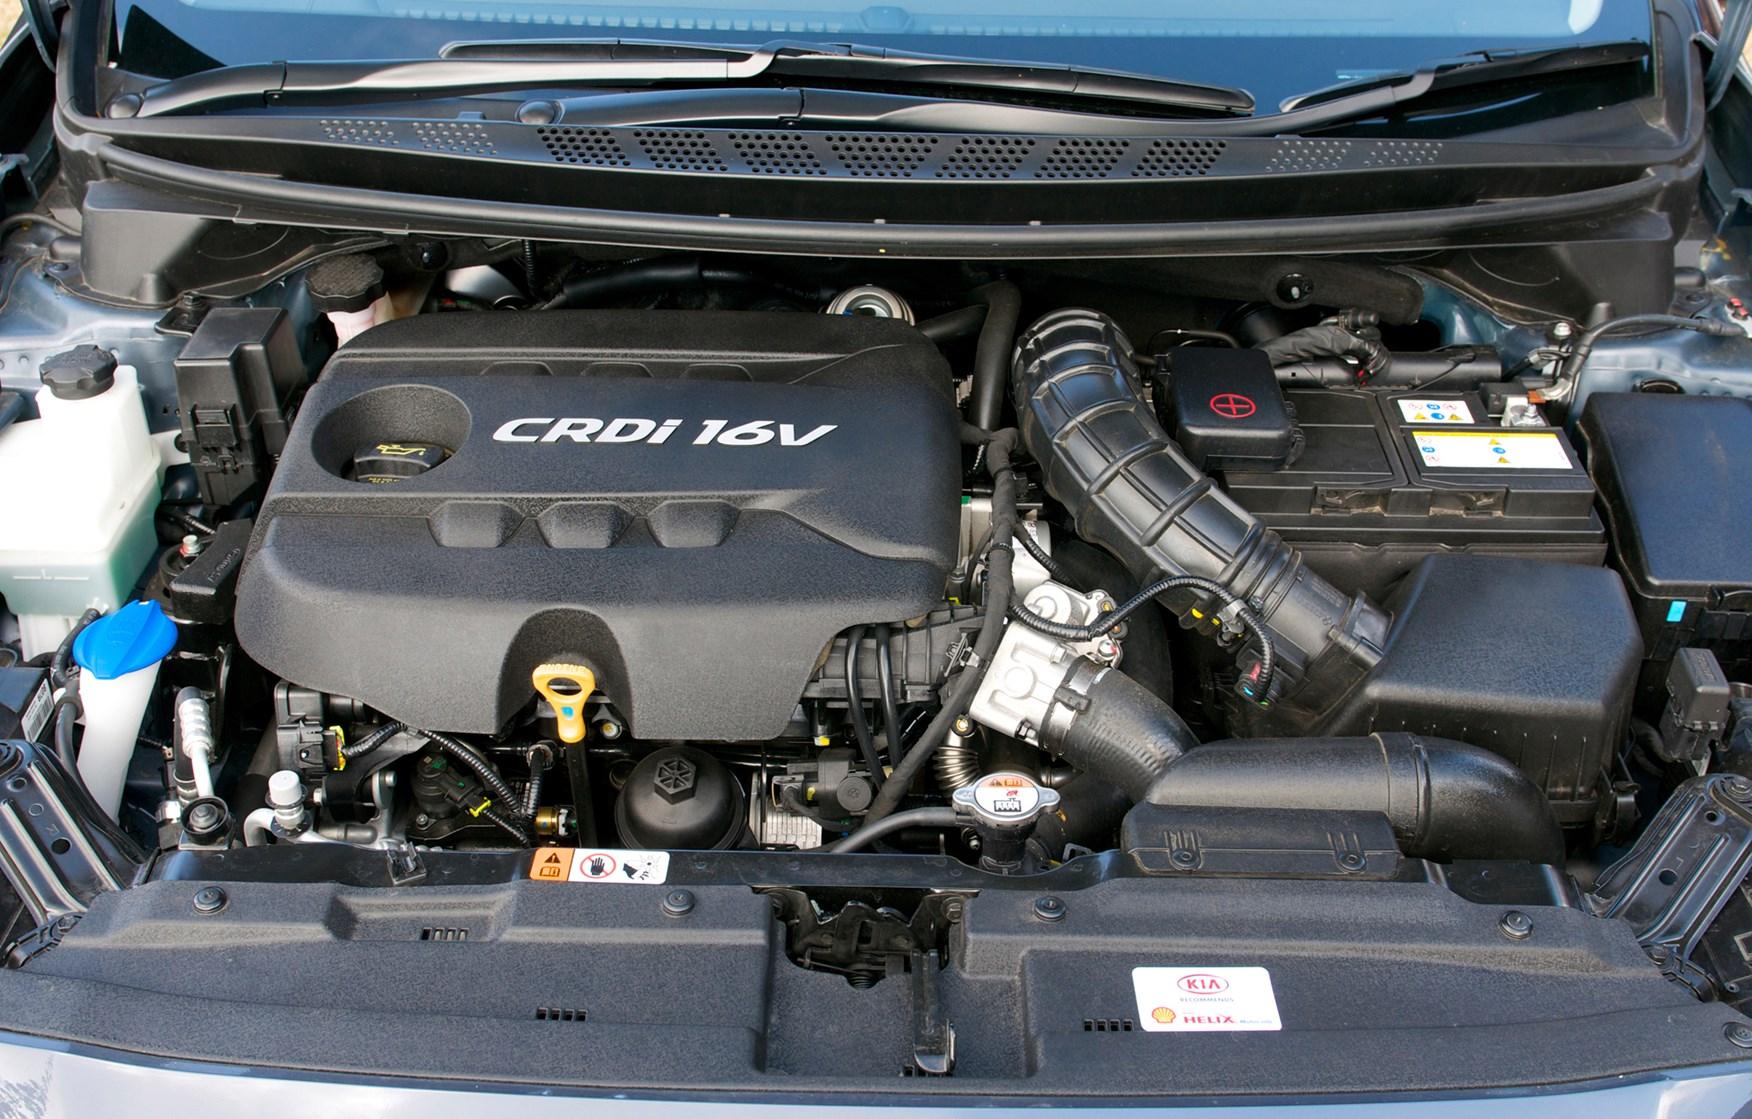 Kia Ceed Engine >> Kia Ceed Sportswagon Review 2012 Parkers